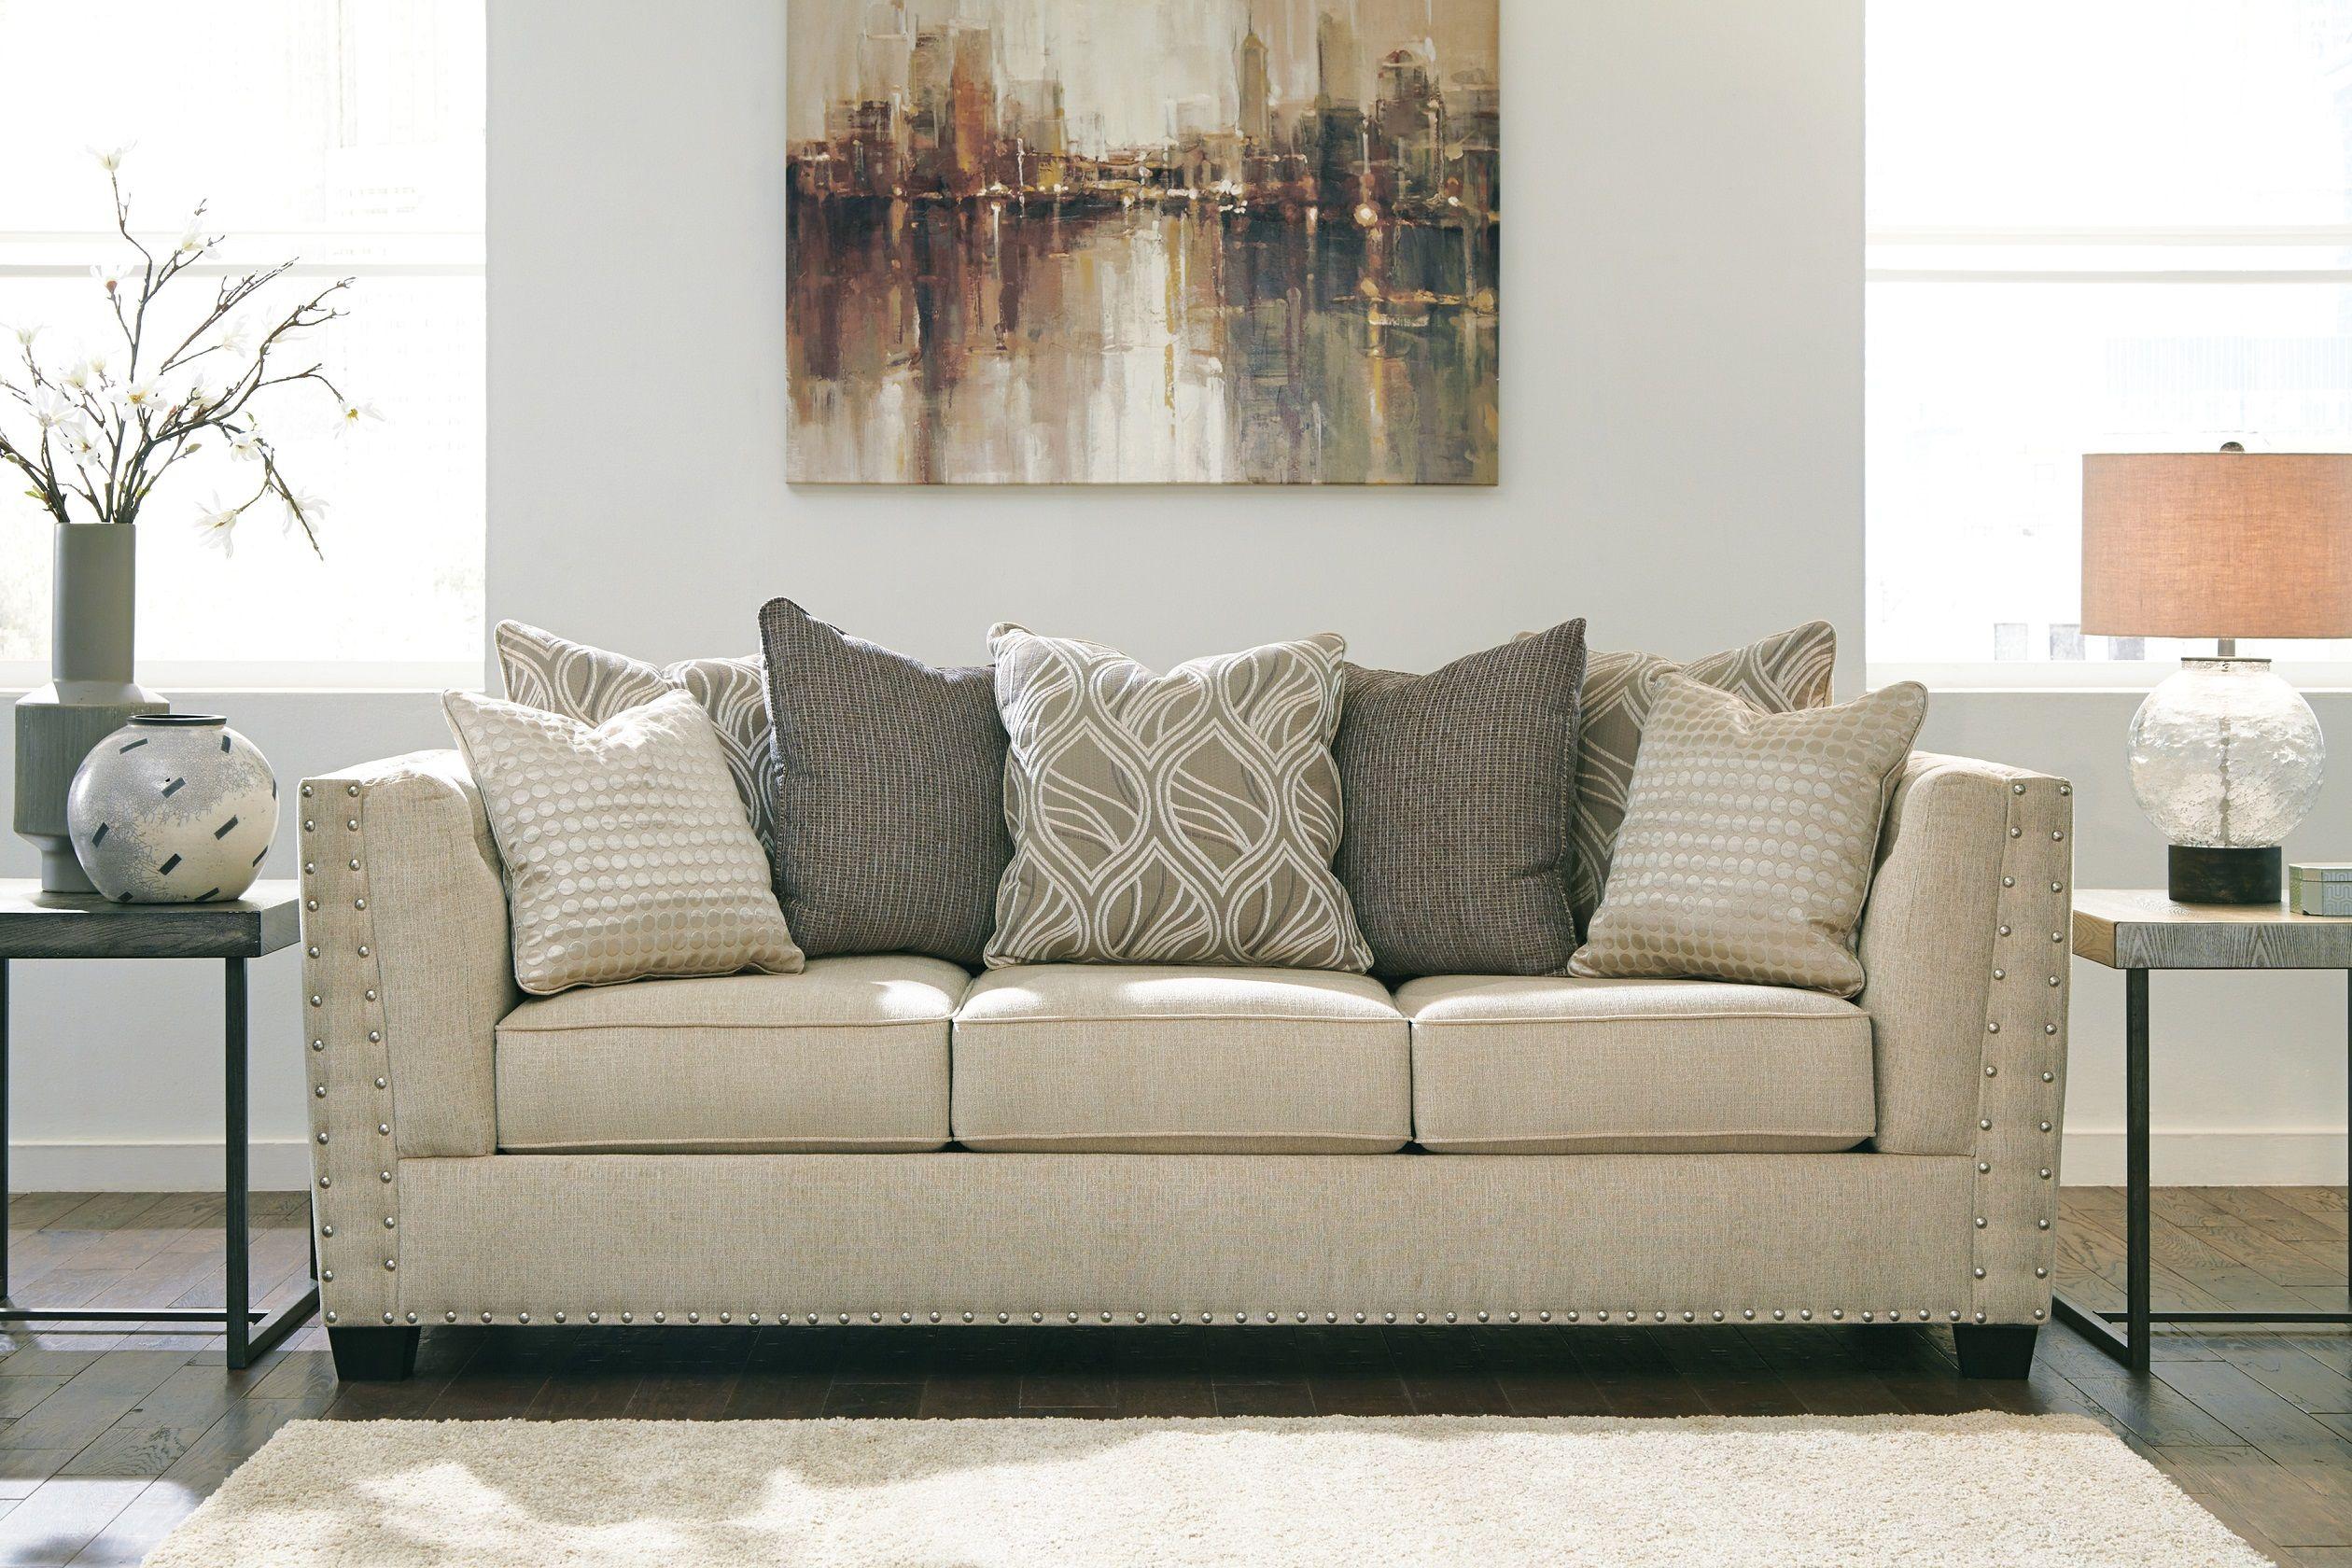 Living Room Sofa Locklee By Ashley Furniture At Kensington. Bedroom  Furniture Argos Lovely Beautiful Kensington Northfield Nj